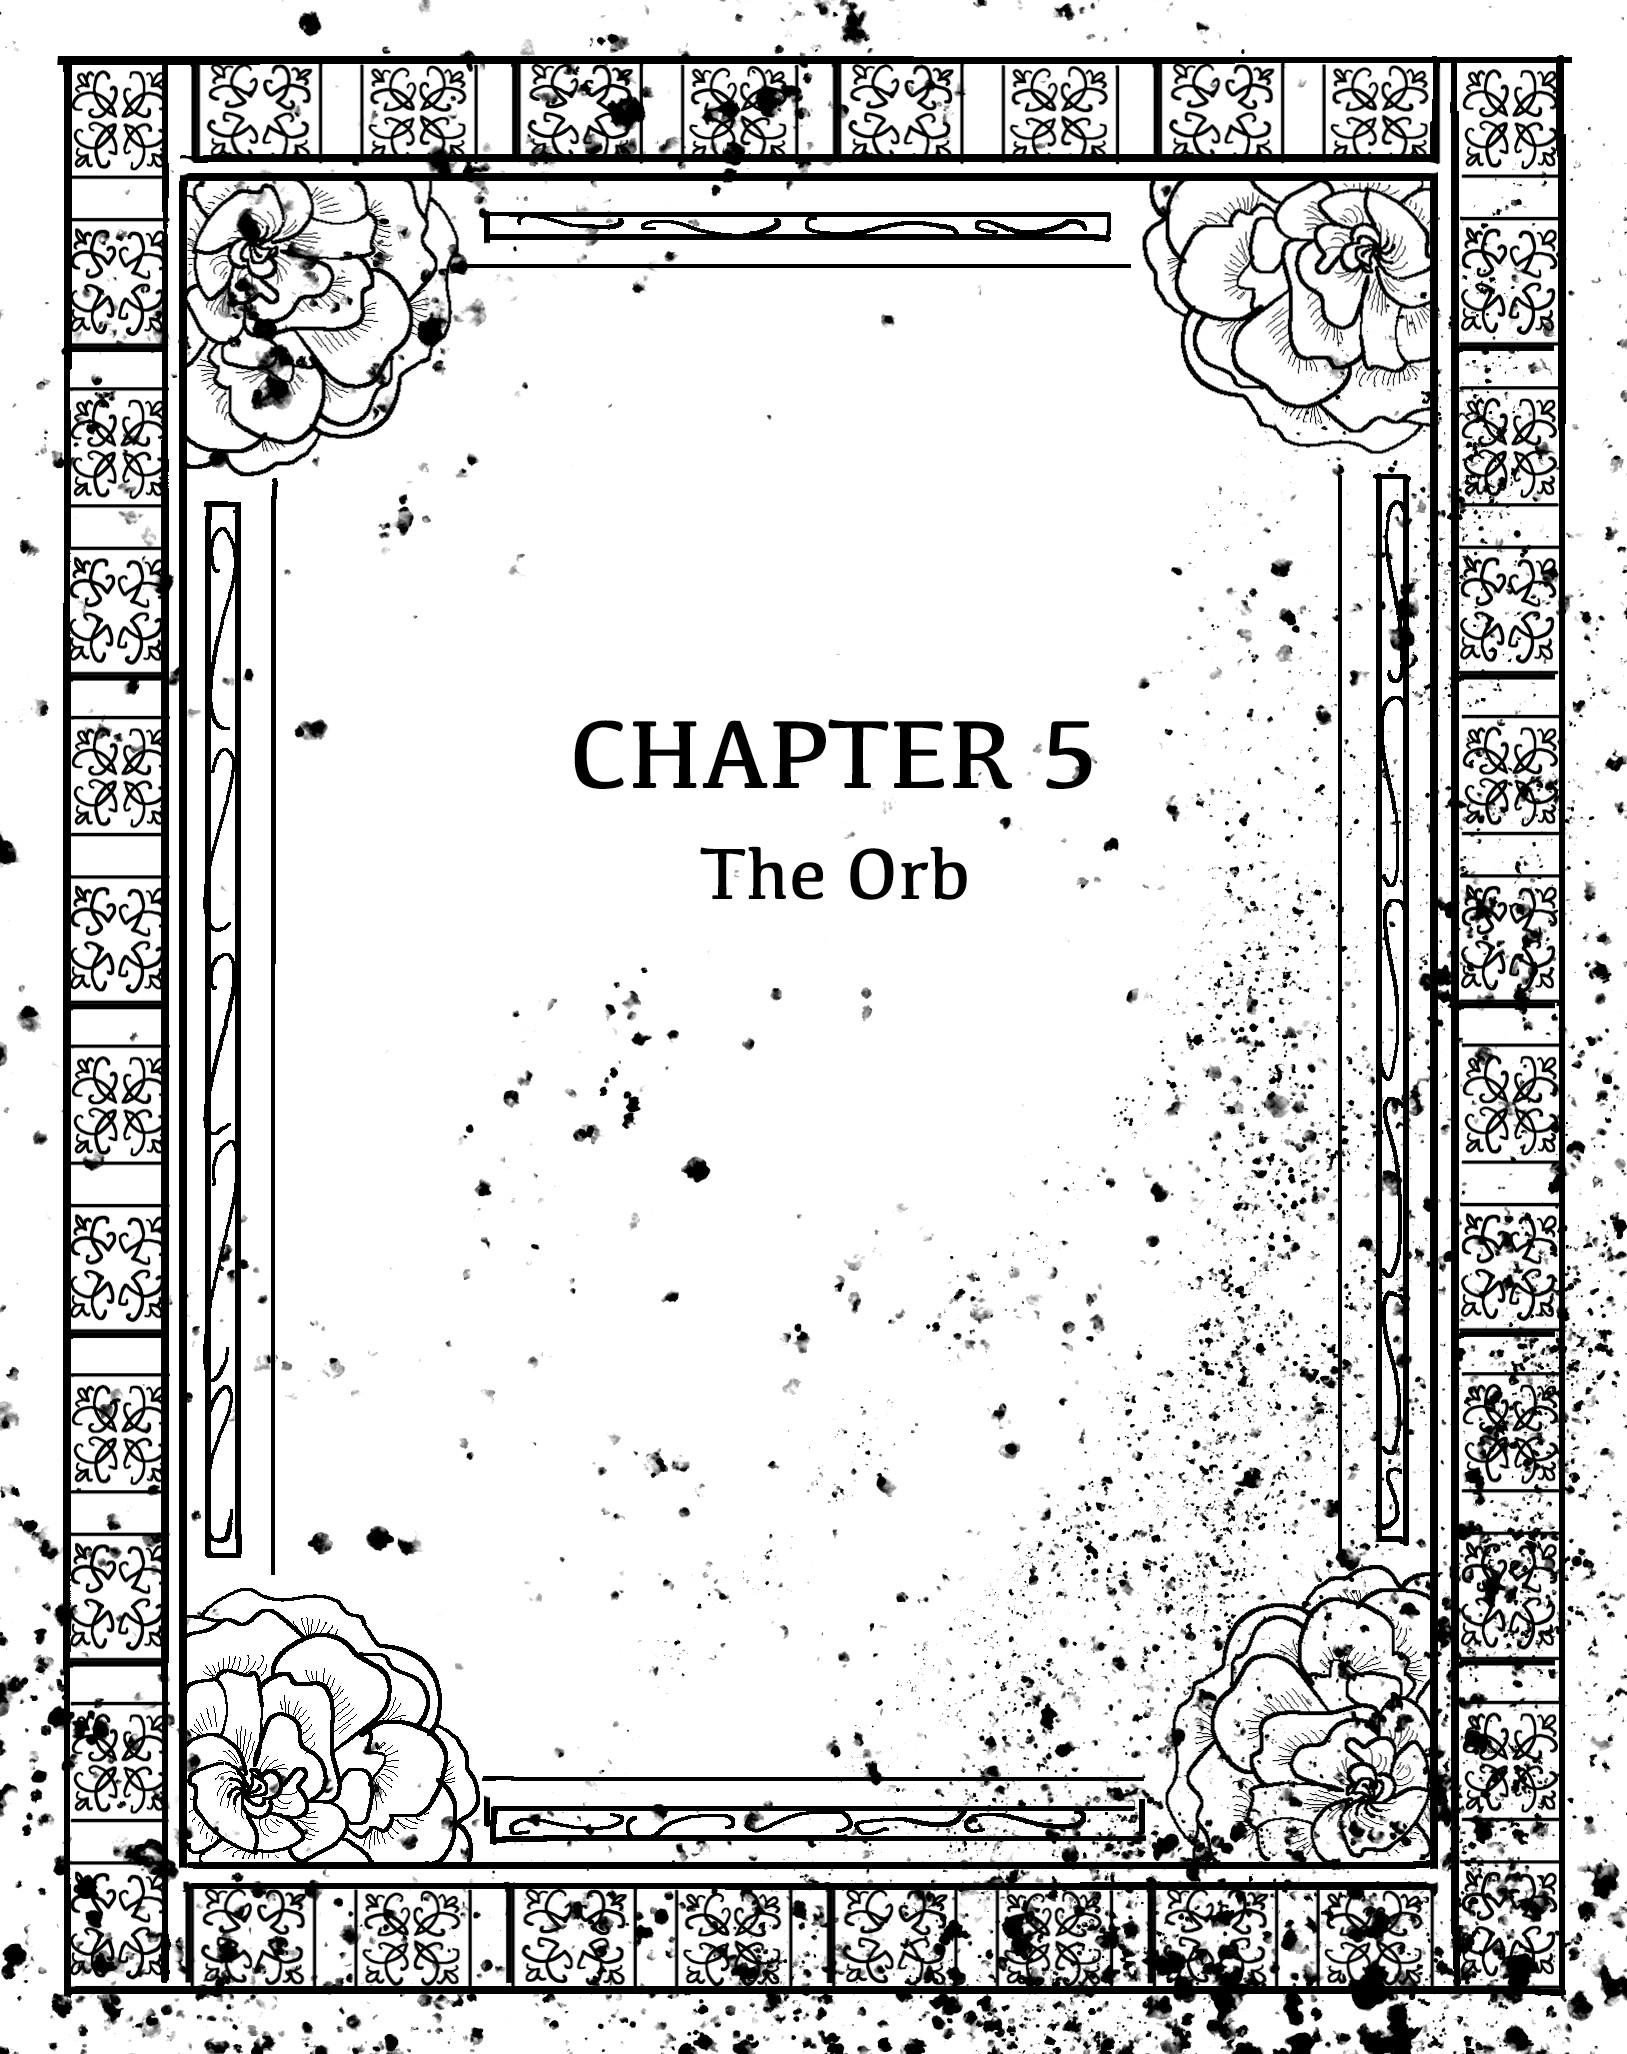 Amnesia_ChapterCard_5.jpg